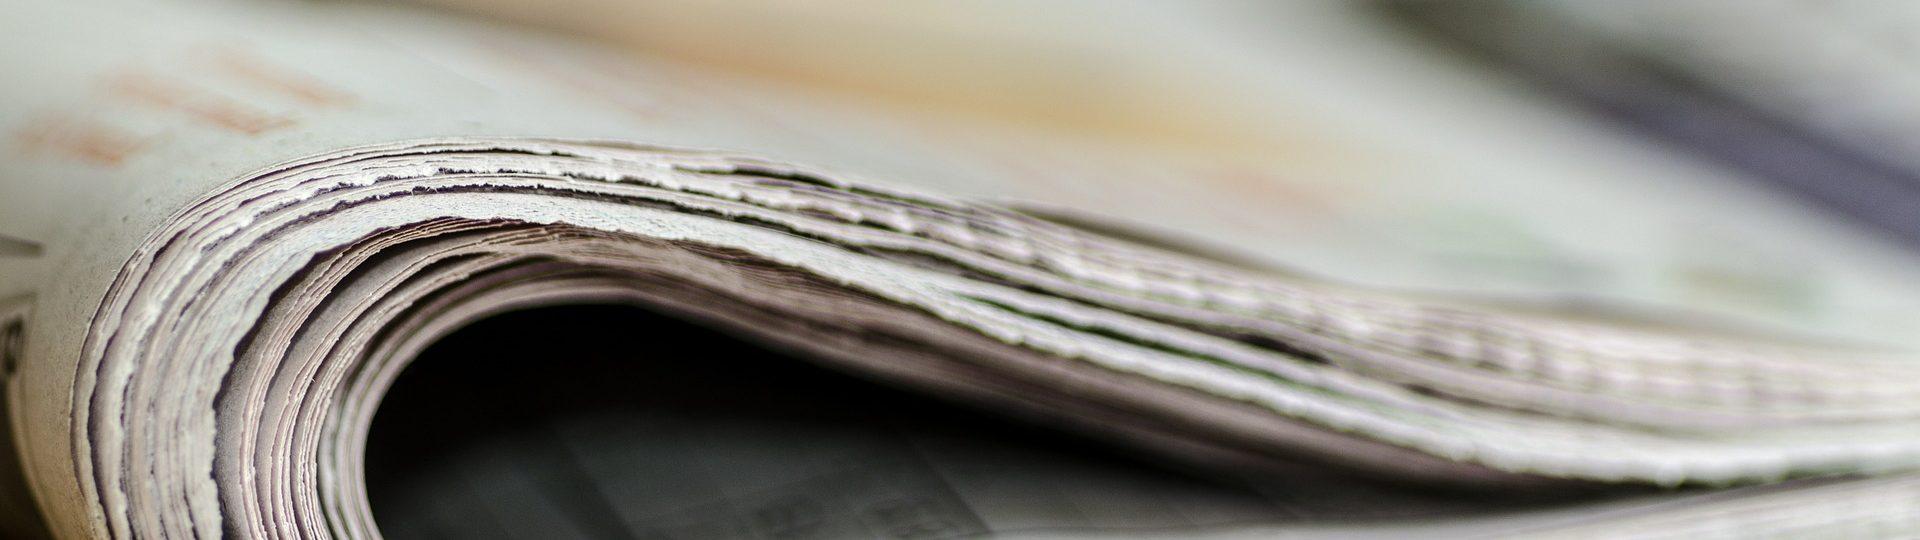 newspapers-Andrys@pixabay